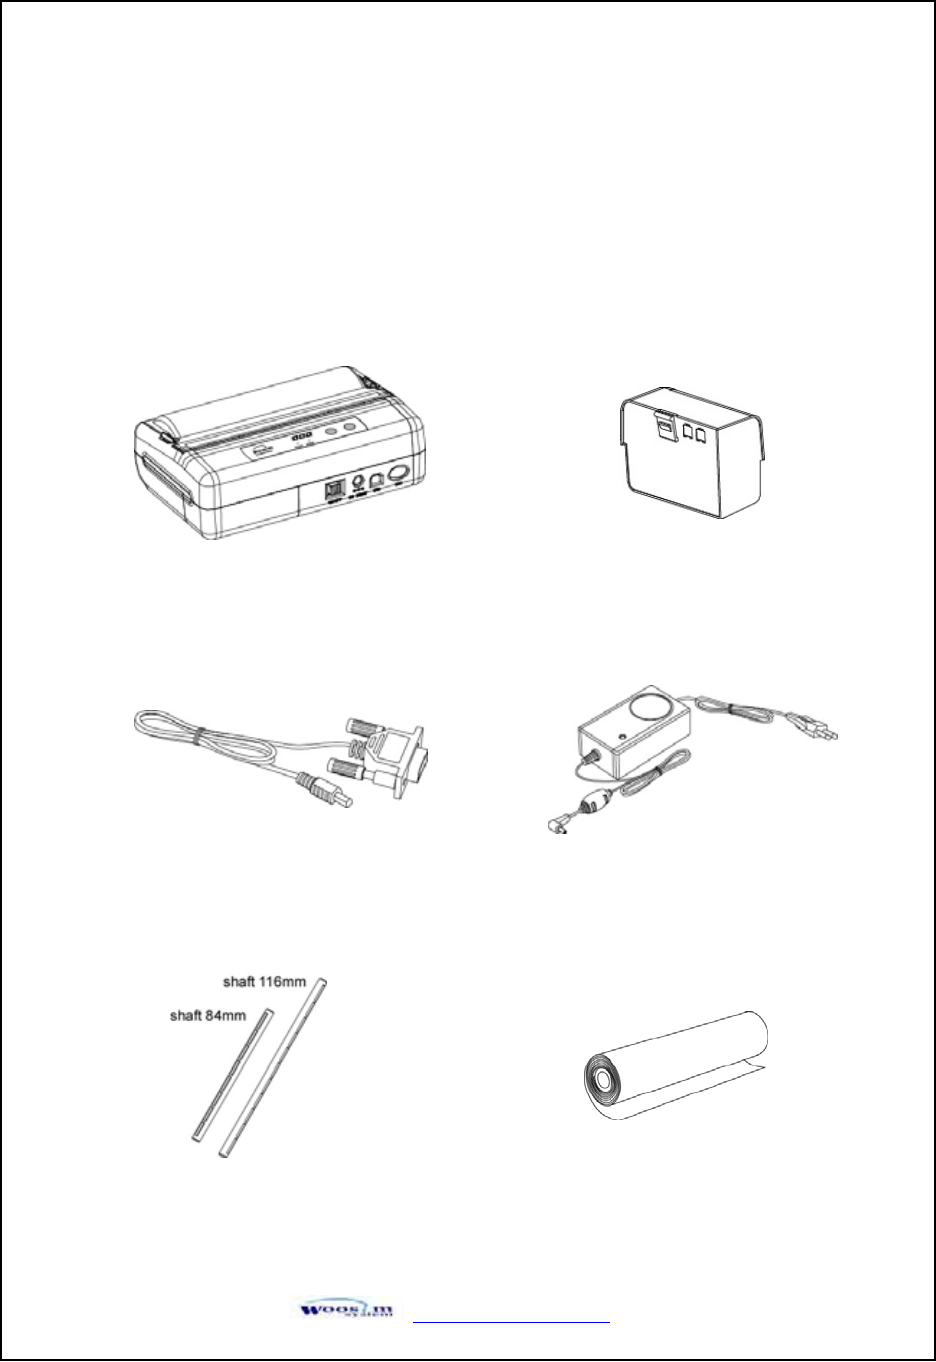 Woosim System PORTI-W40 Bluetooth Mobile Printer User